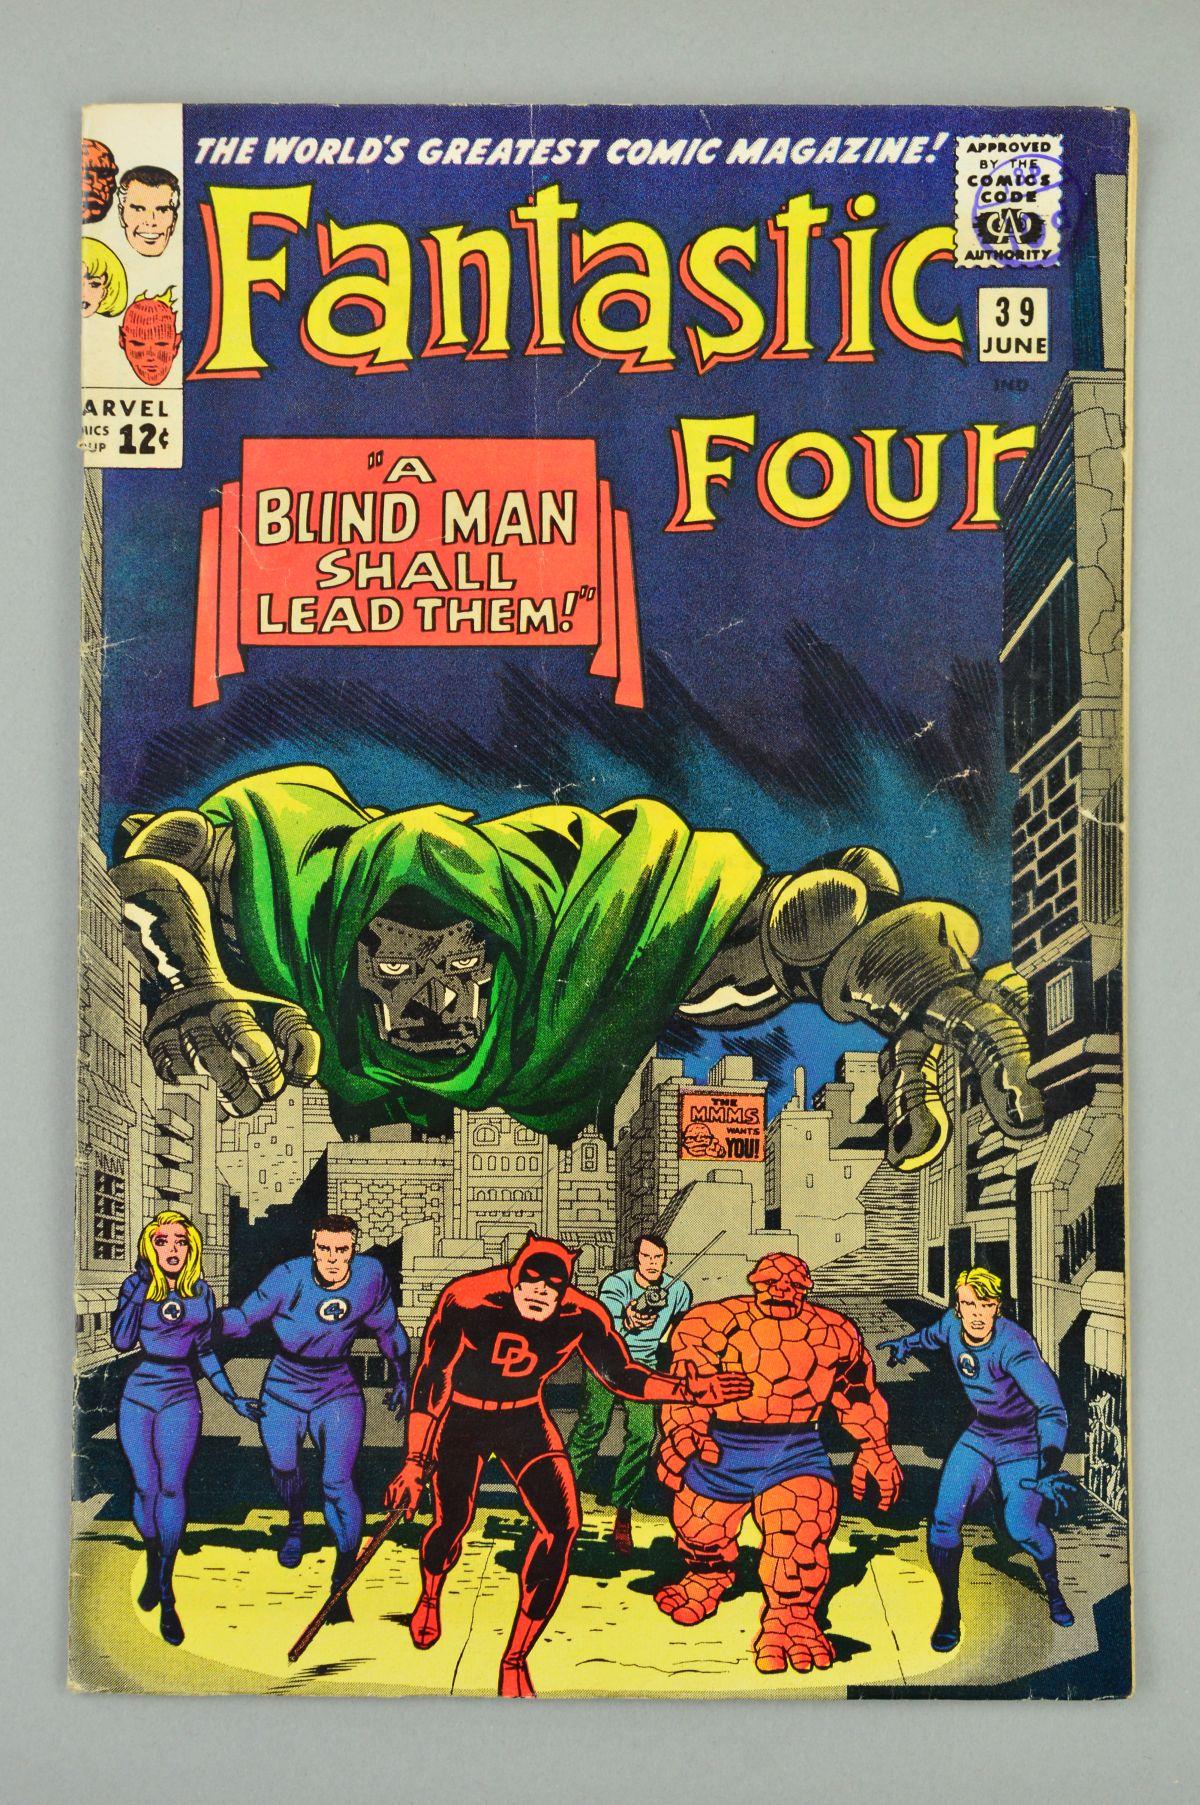 Lot 1838 - Fantastic Four (1961) #39, Published:June 10, 1965, Writer:Stan Lee, Penciller:Jack Kirby, Cover